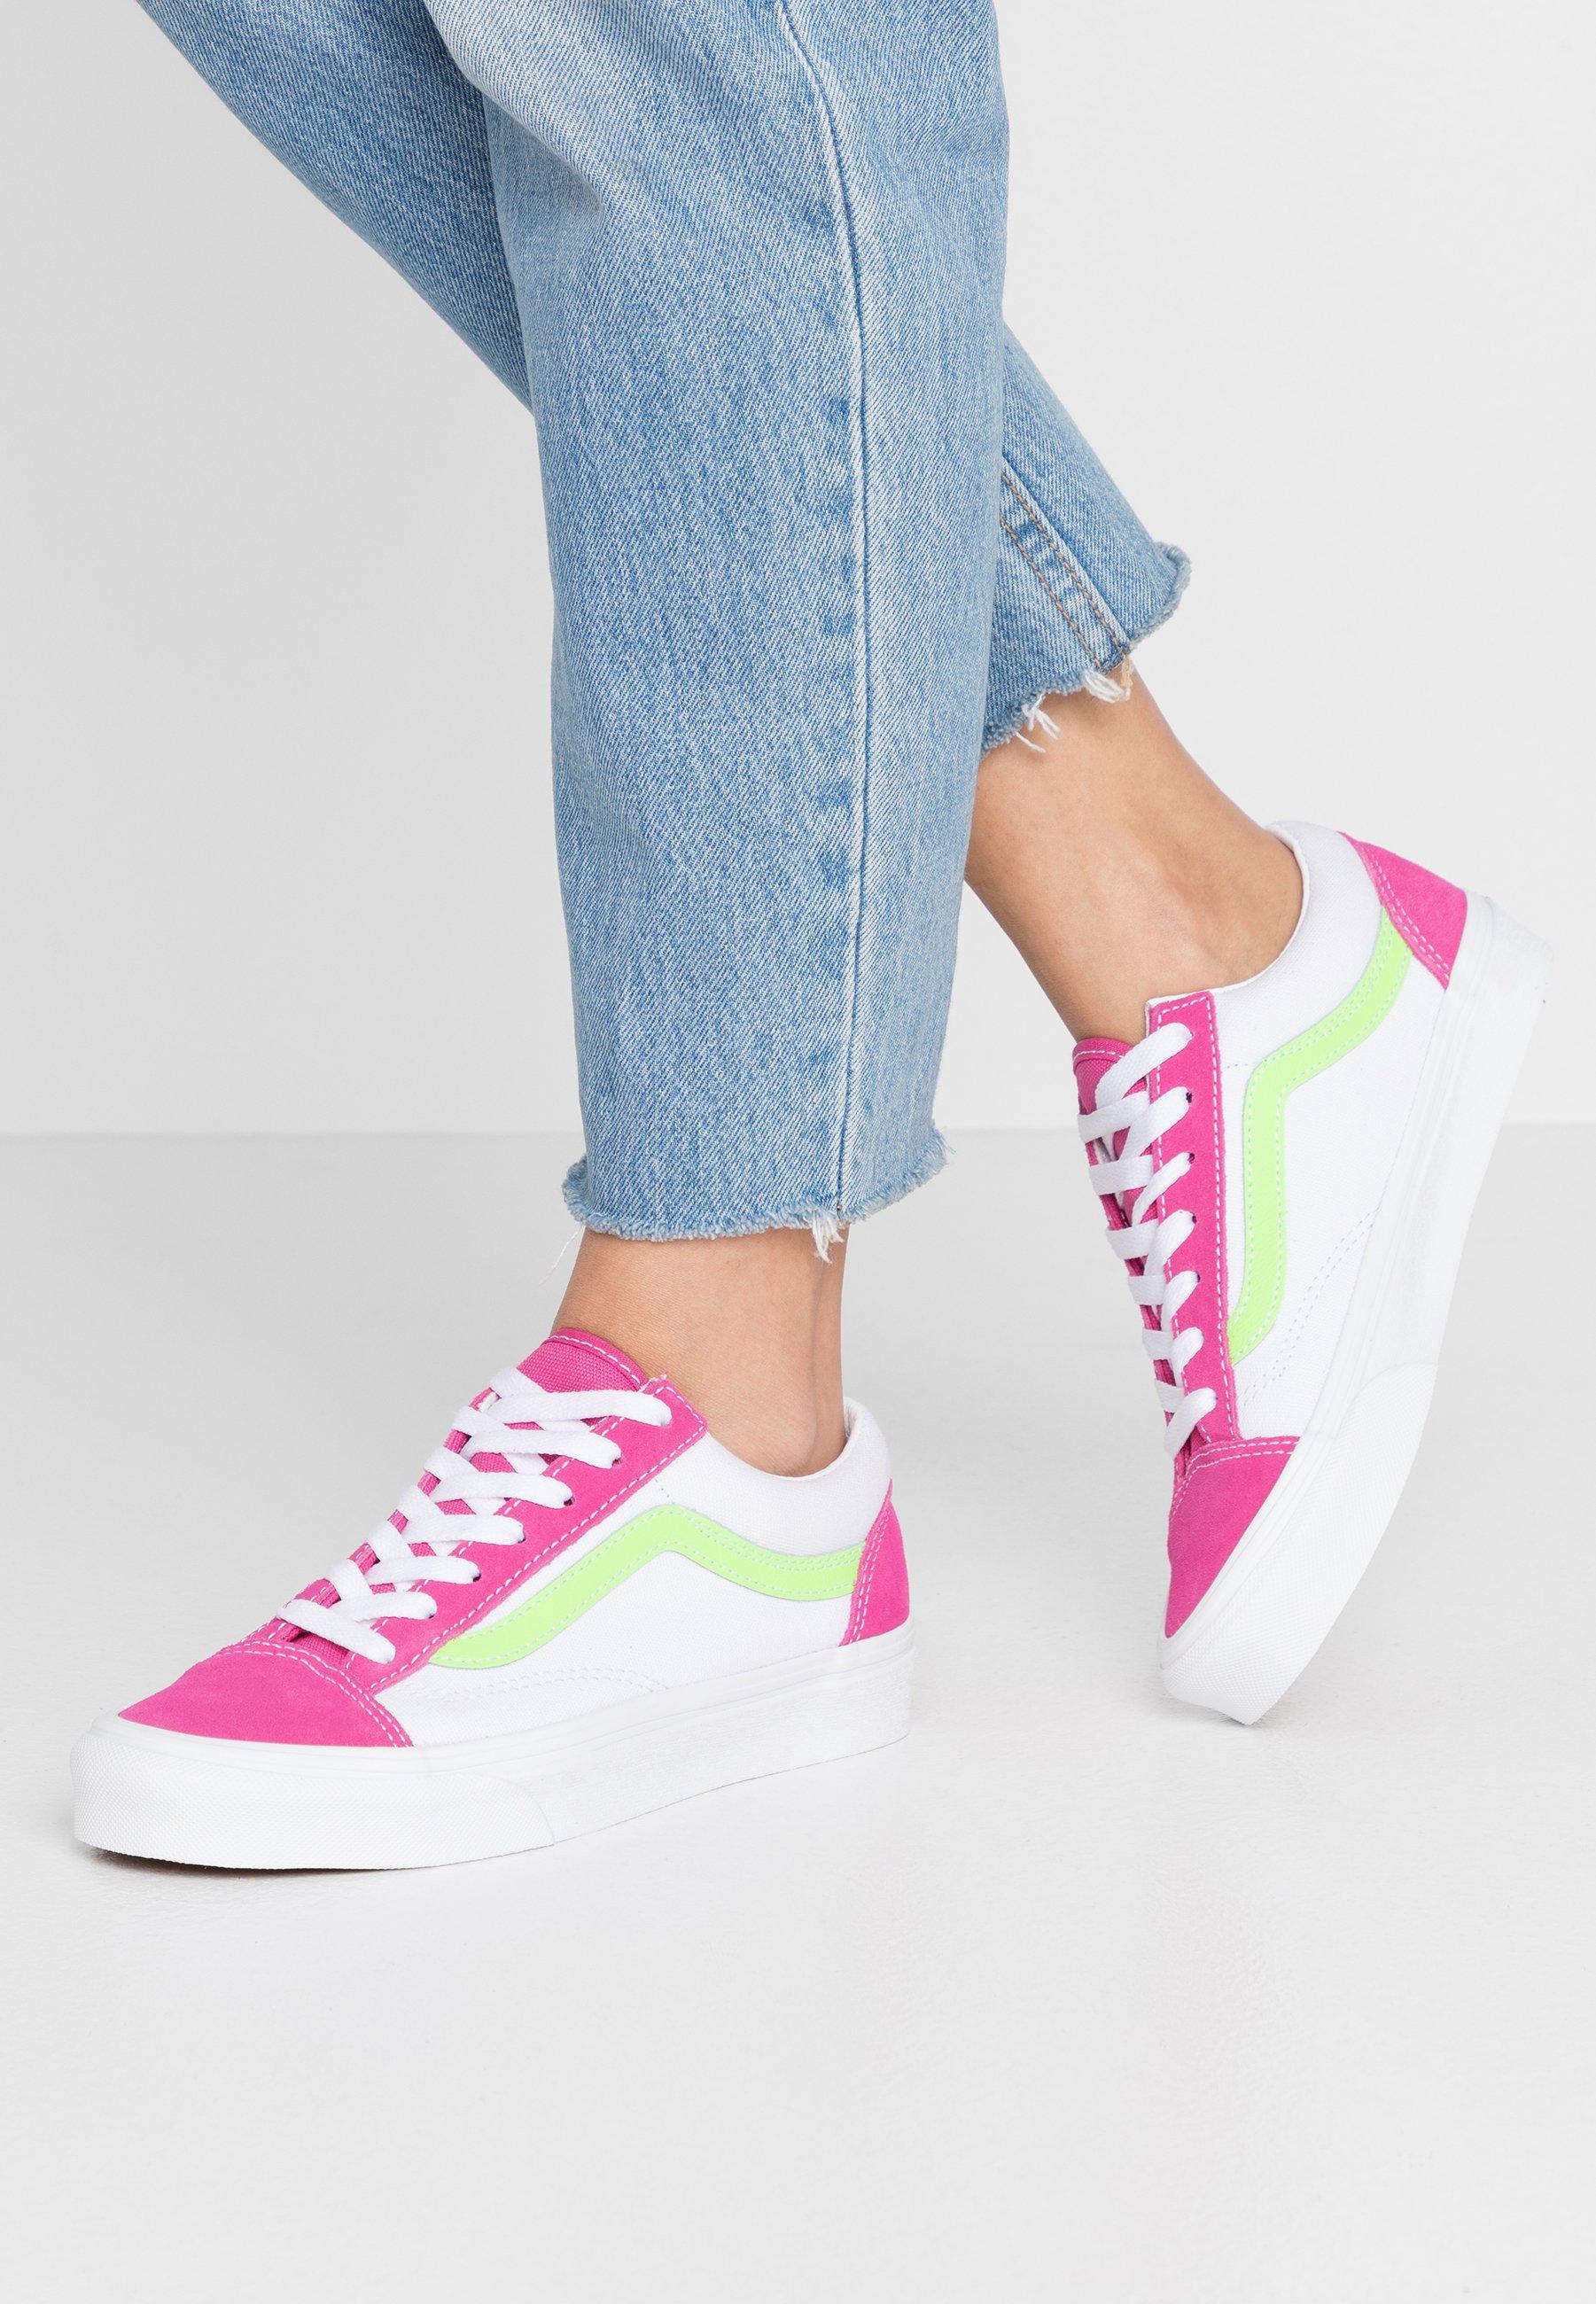 Soldes > chaussure vans rose > en stock